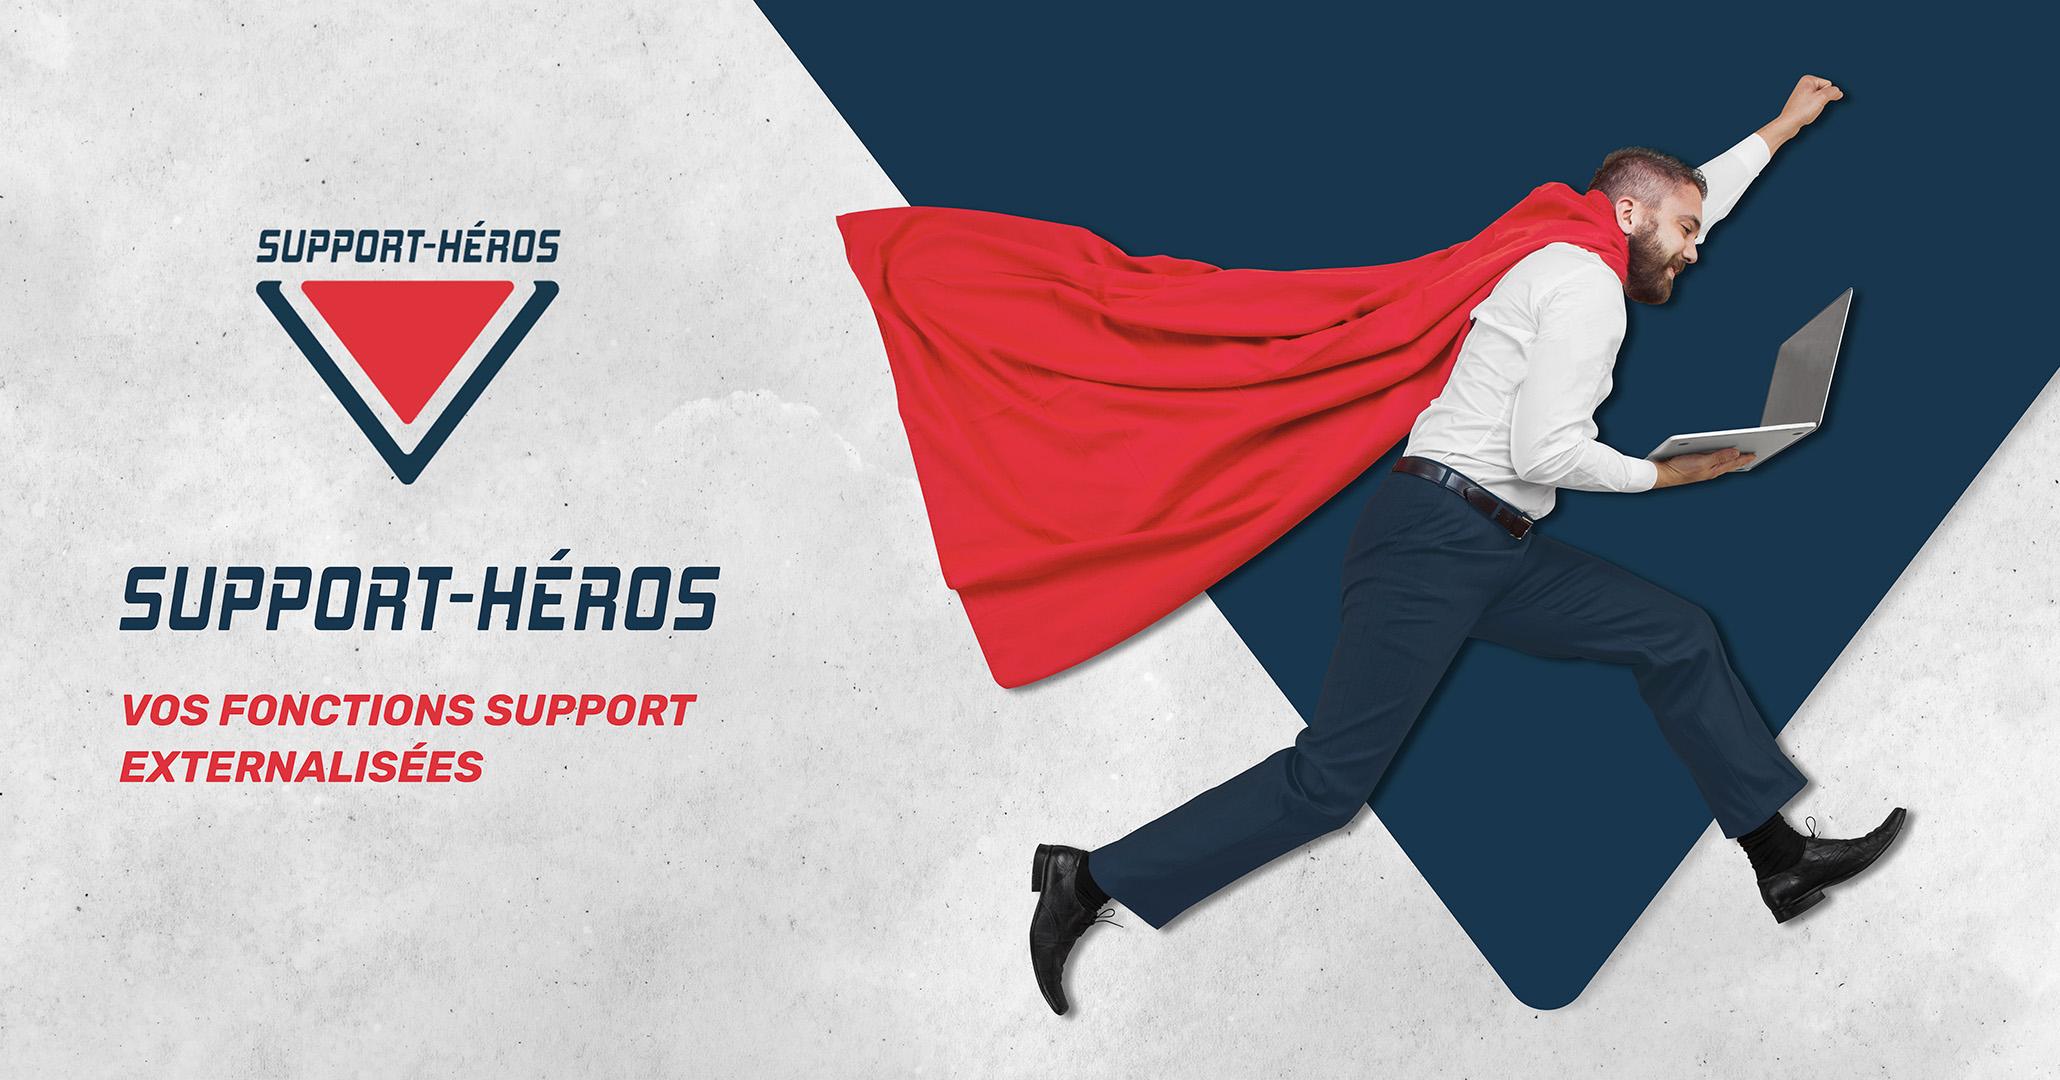 1630432316_suport-hero.jpg